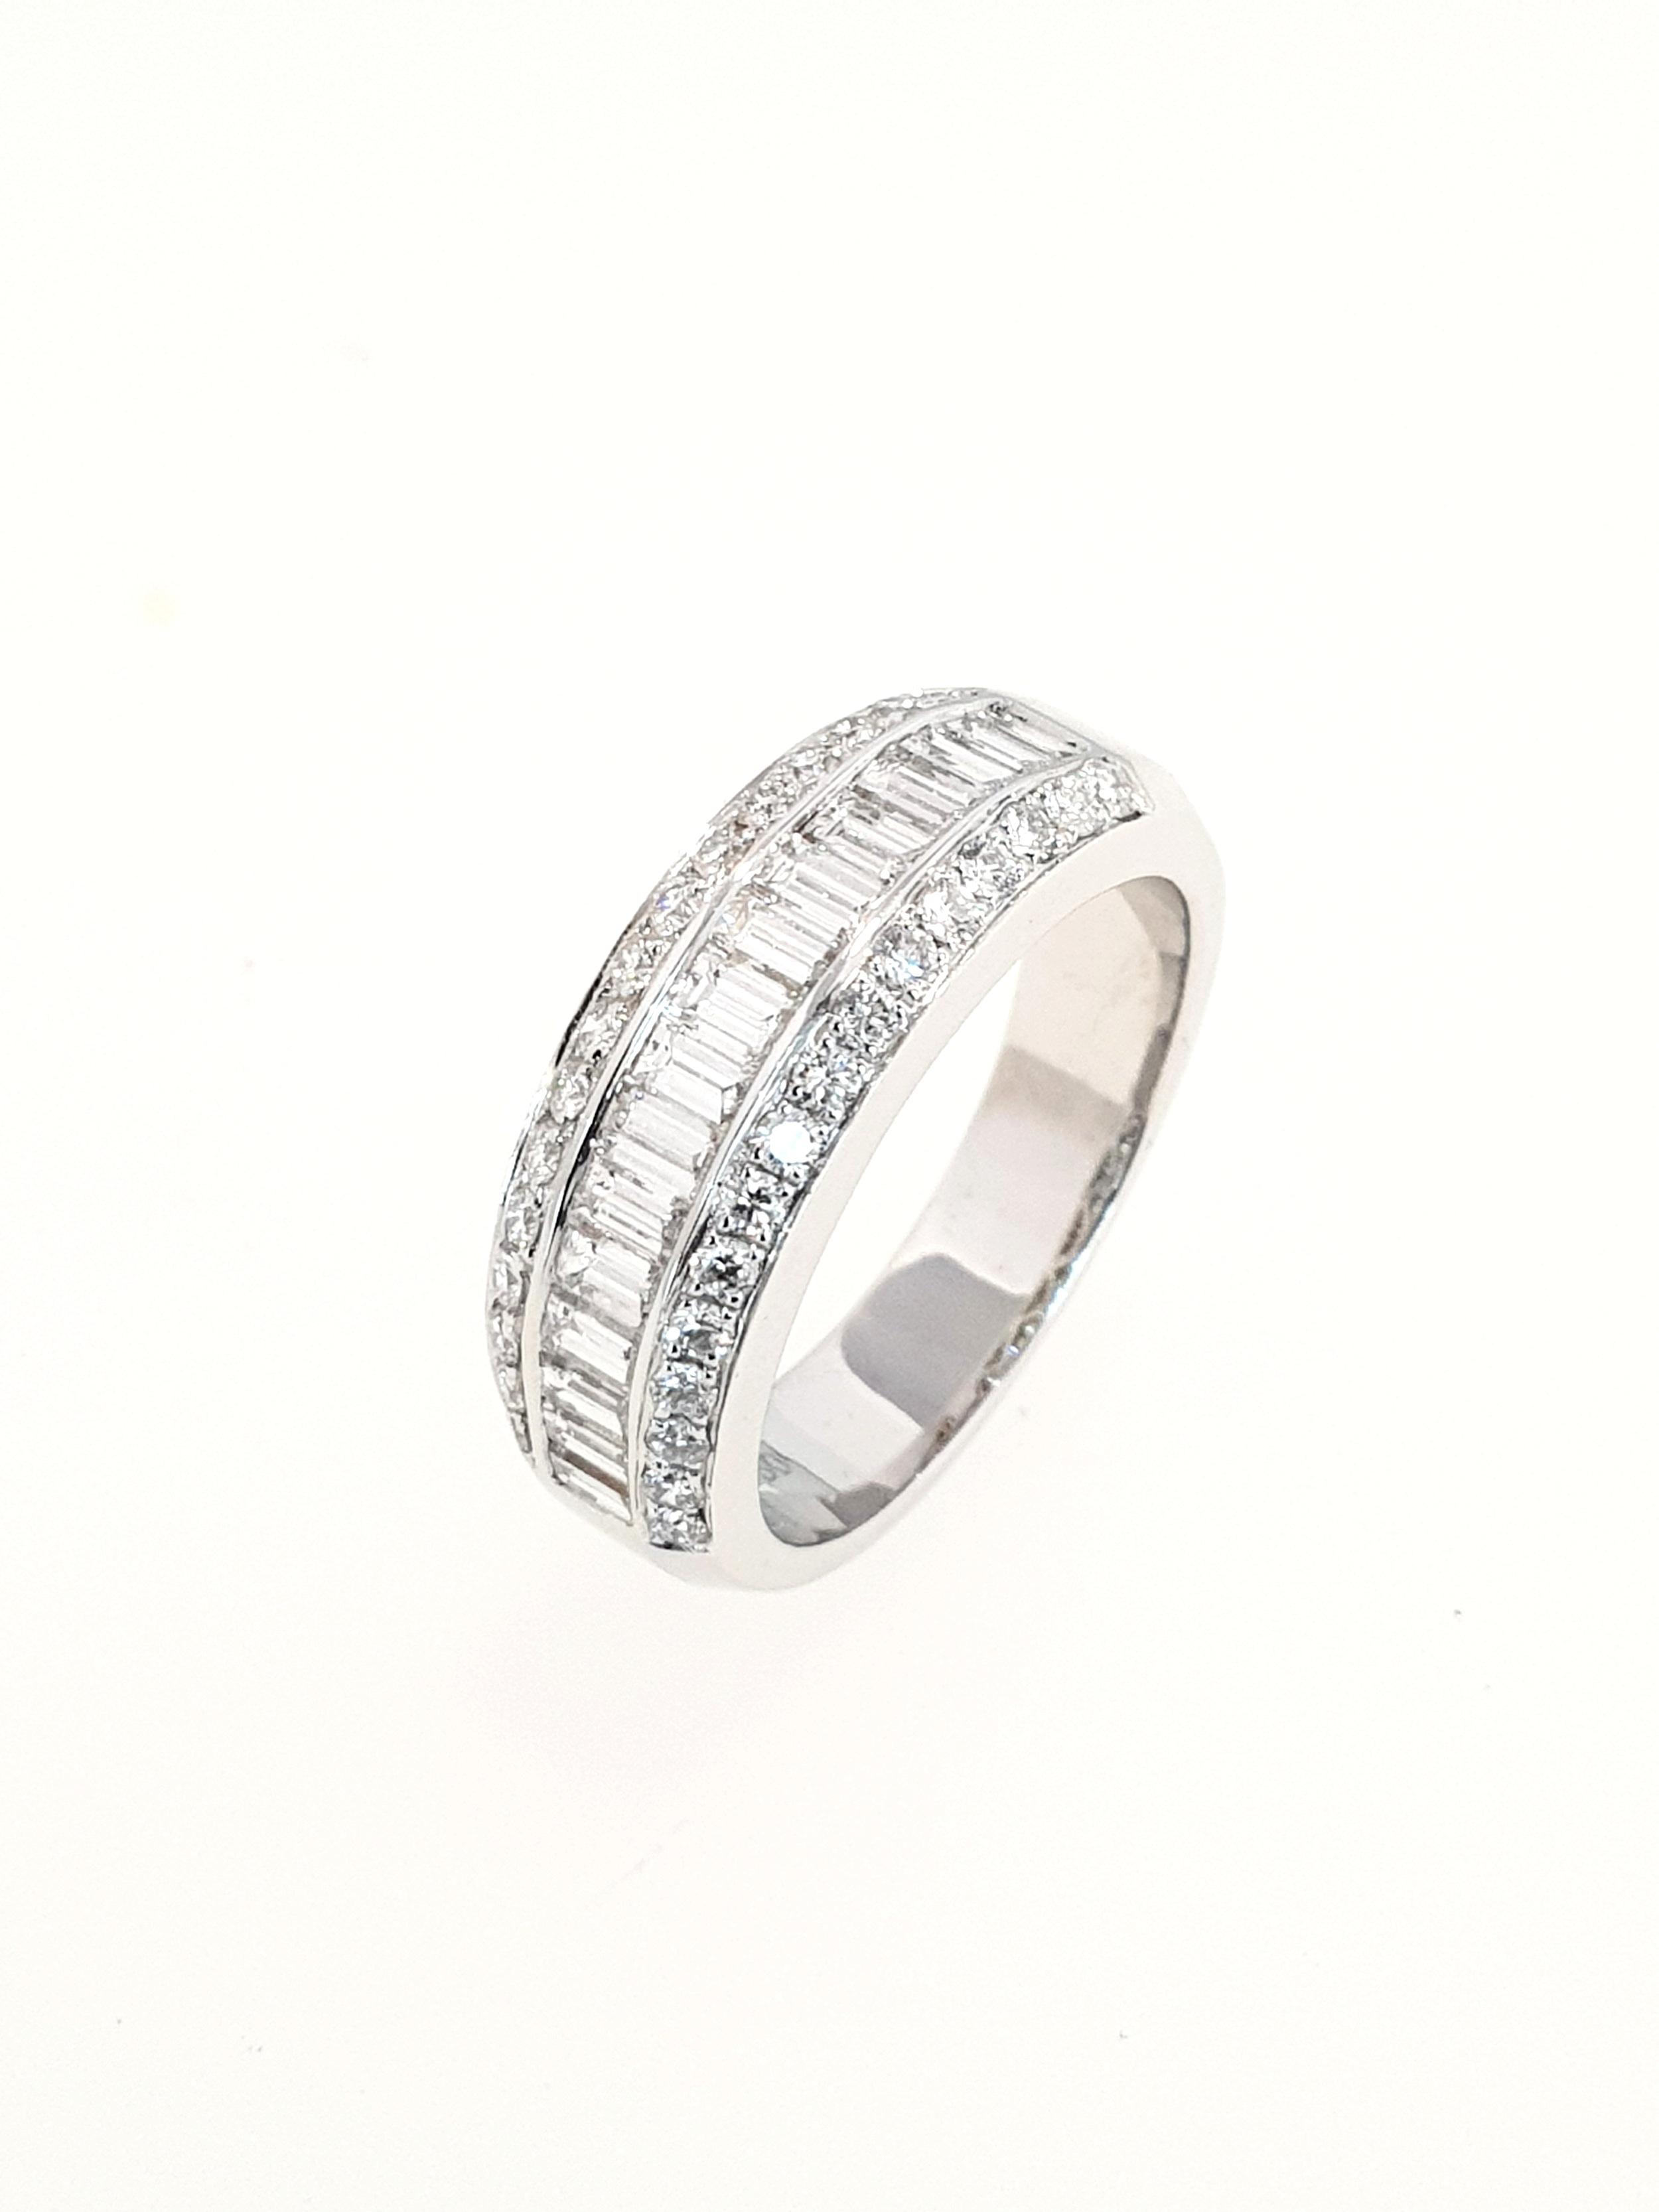 18ct White Gold 3 row Diamond Ring  1.13ct, G, SI1  Stock Code: N8924  £3500